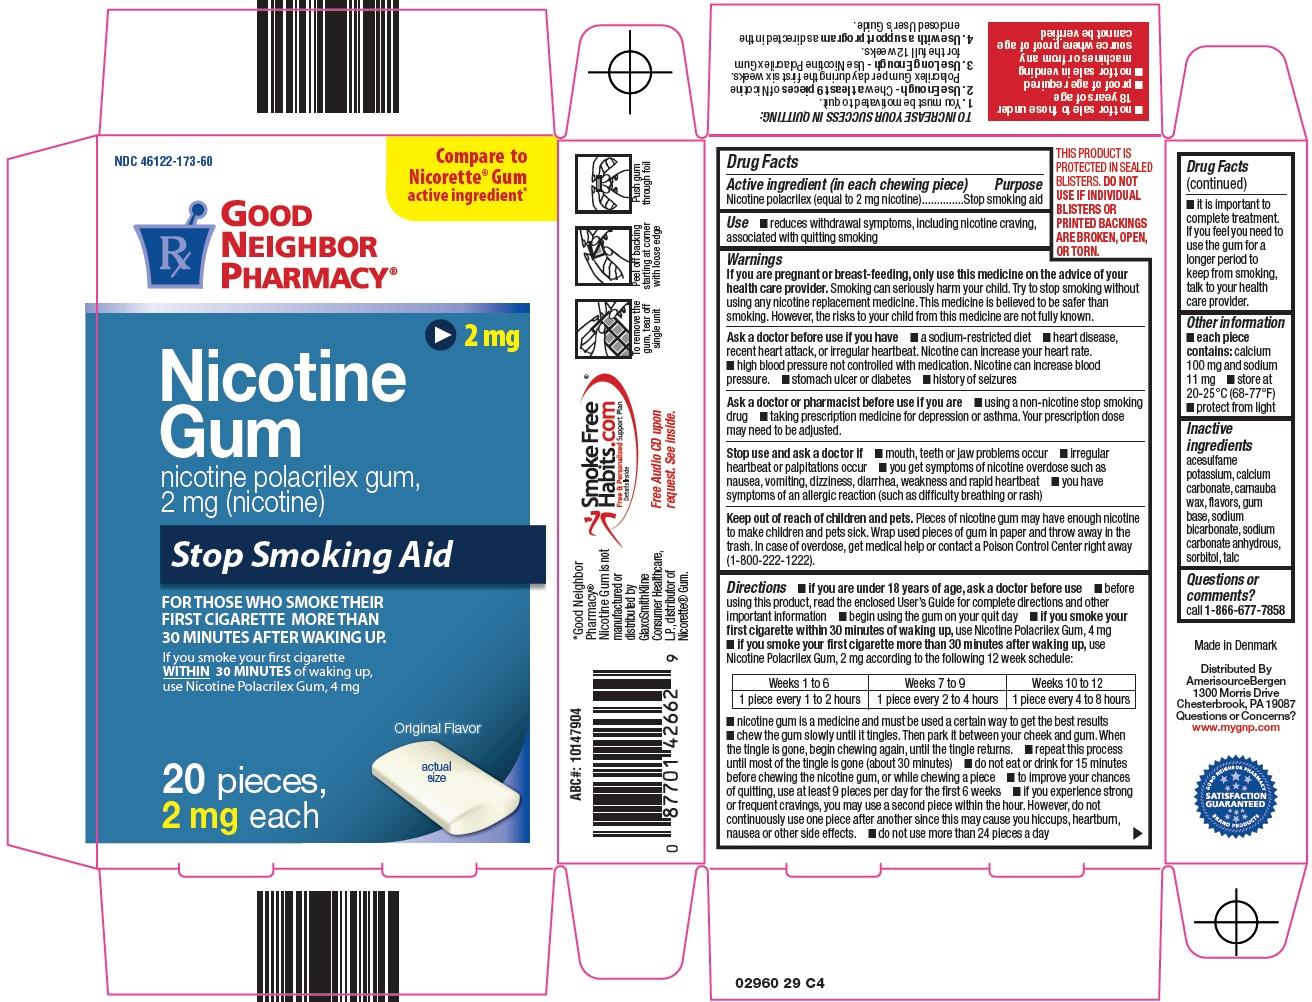 02929-nicotine-gum